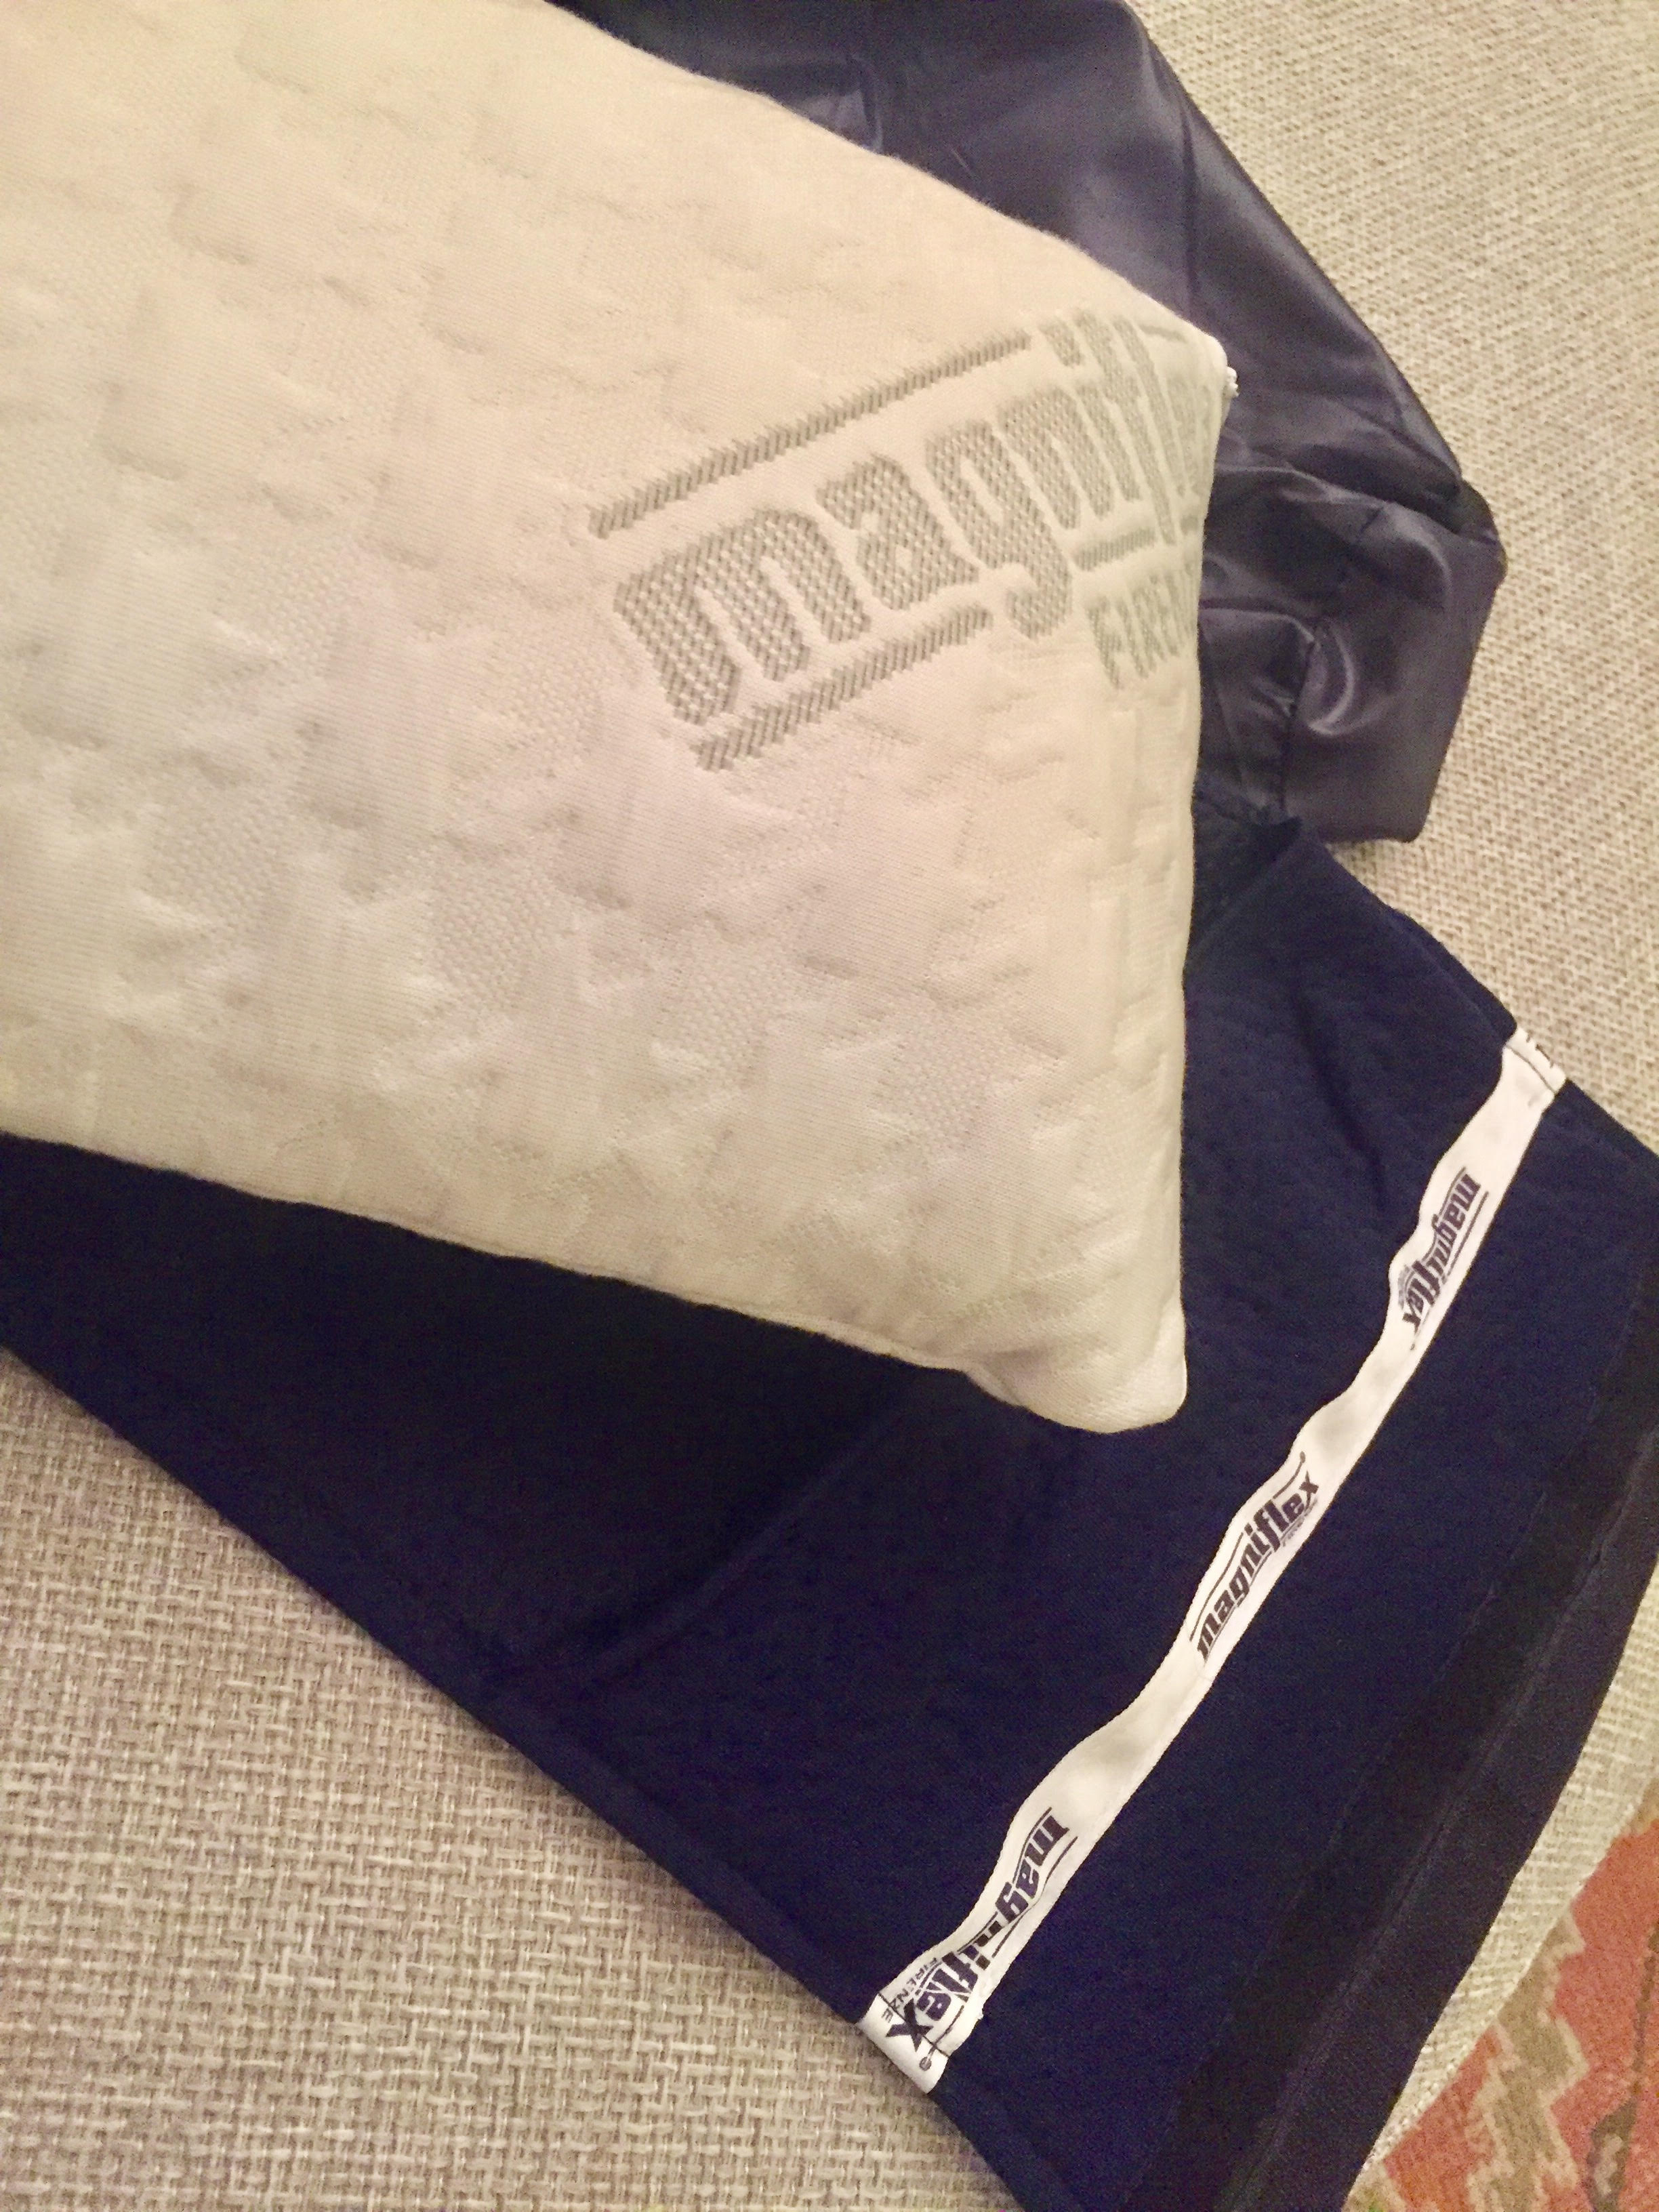 sushi-pillow-magniflex-viaggio-cuscino